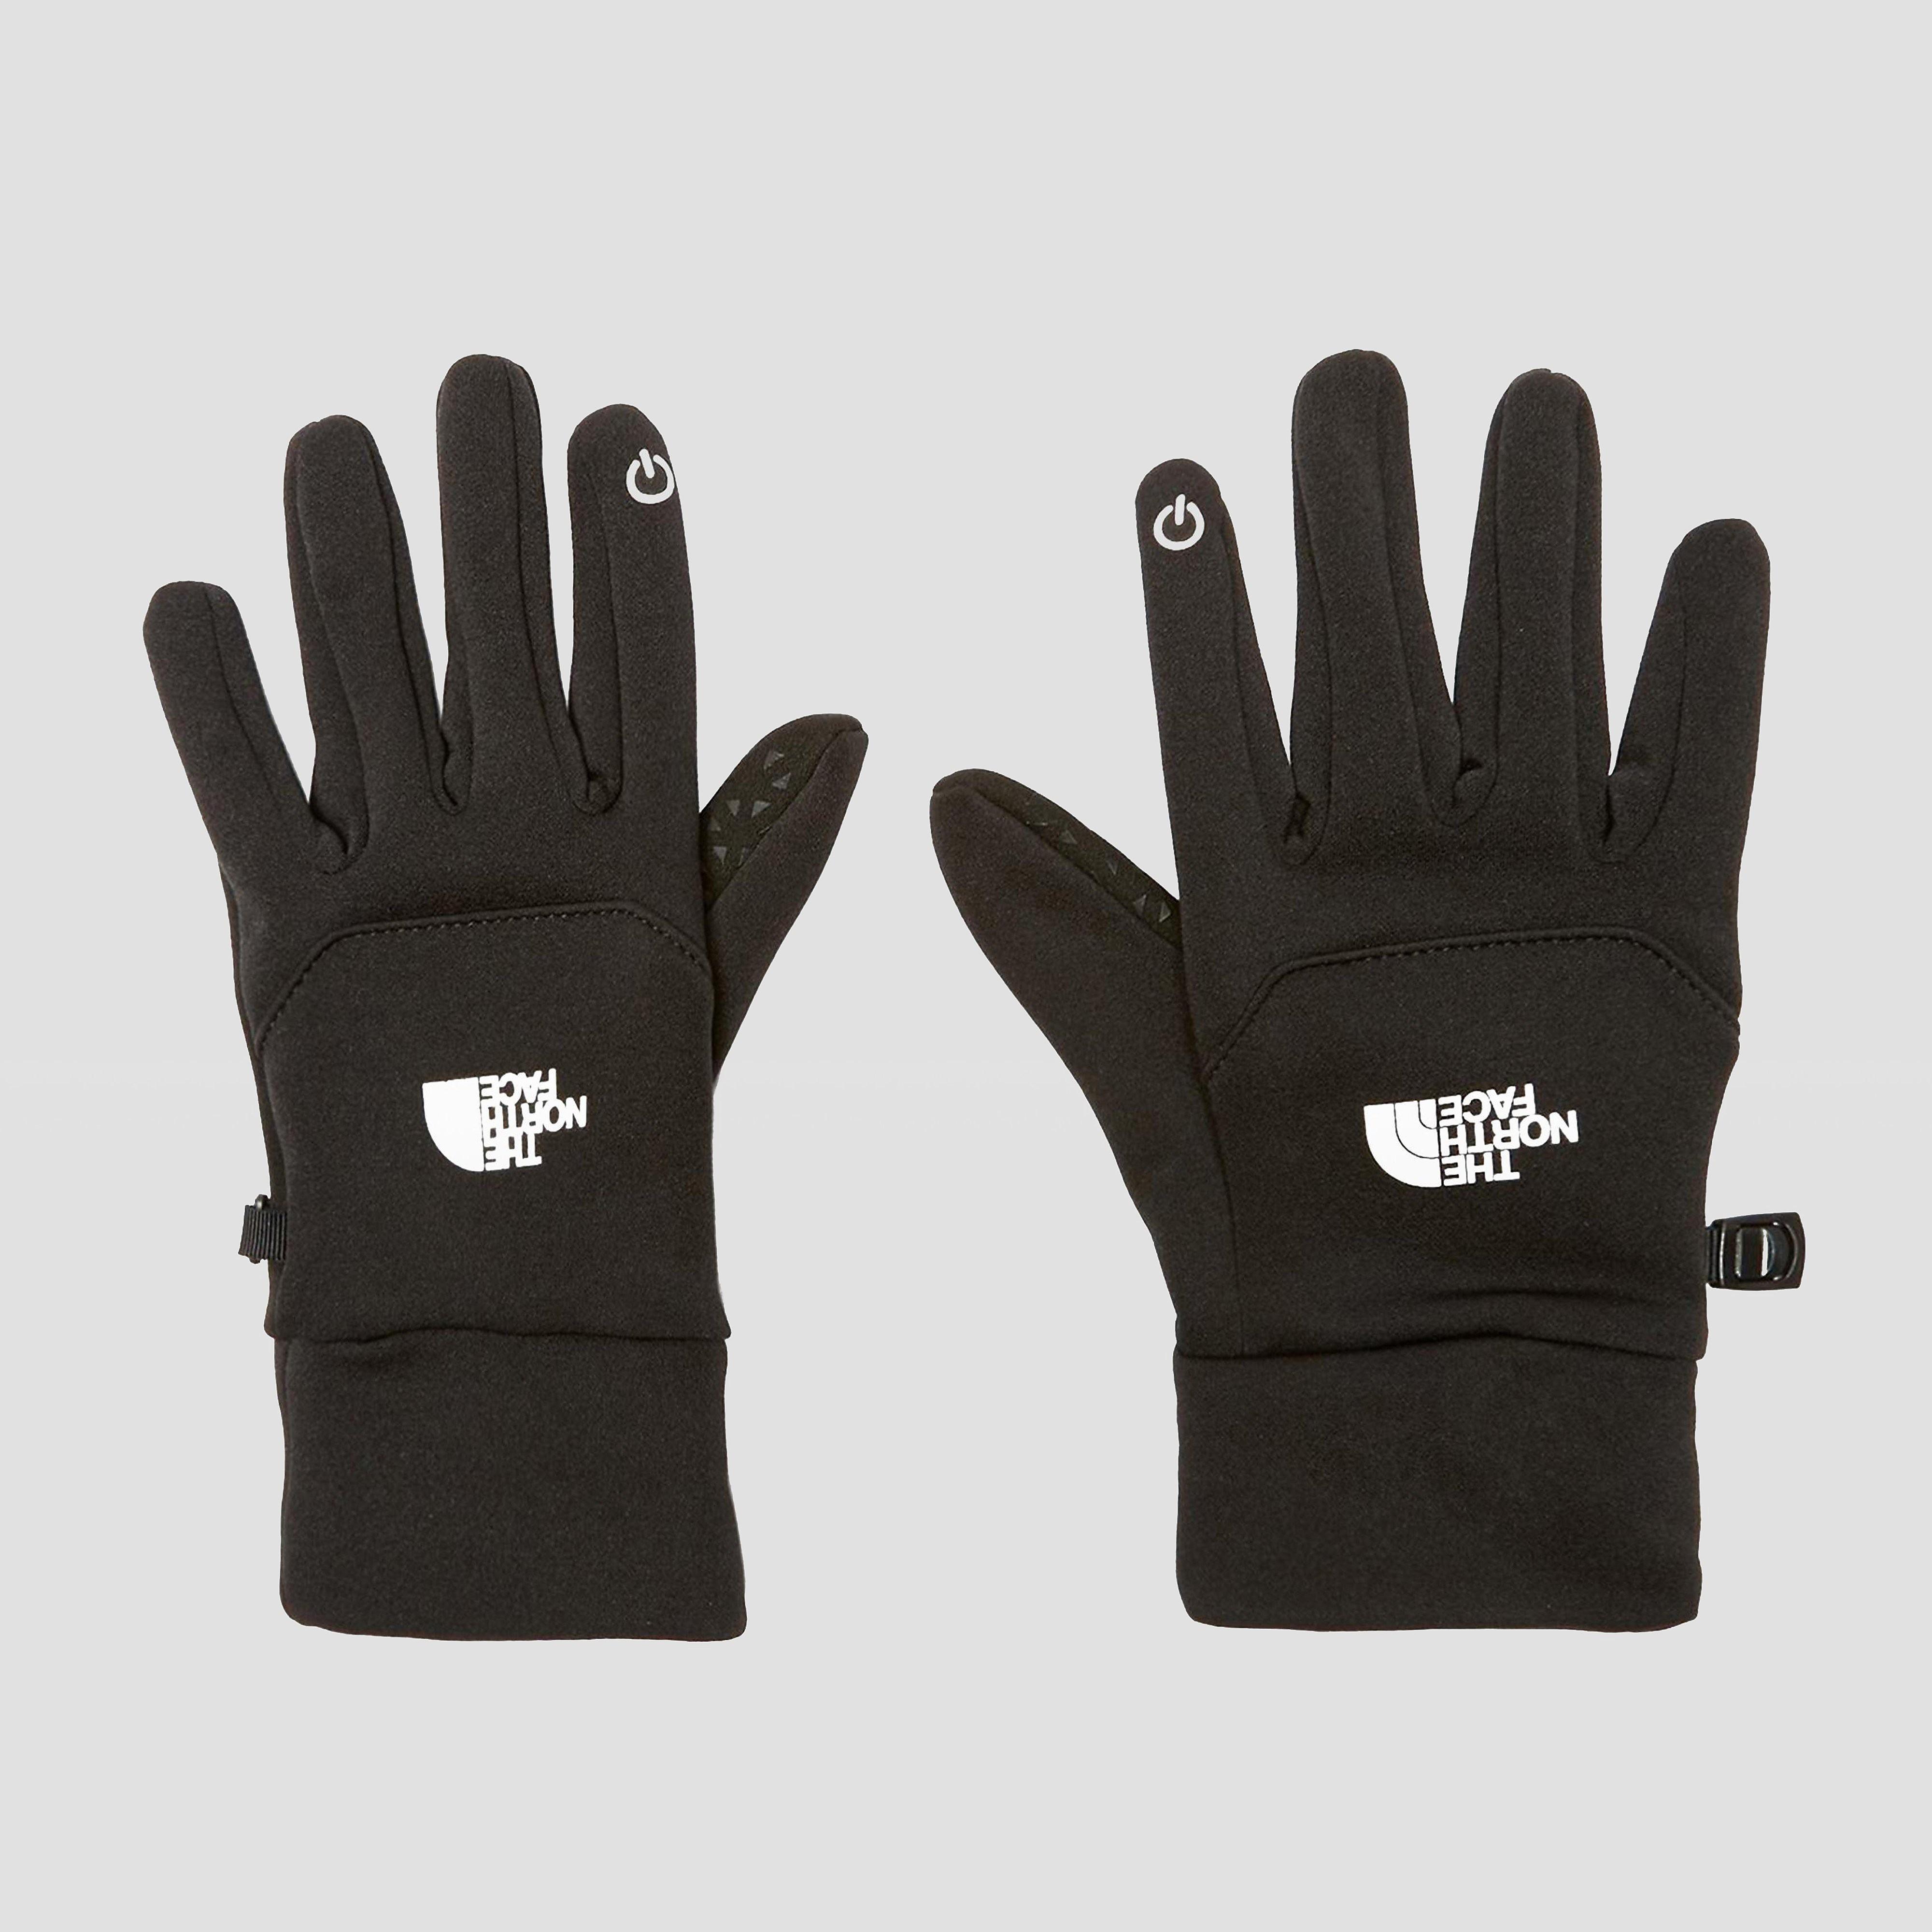 The North Face E-Tip Men's Gloves